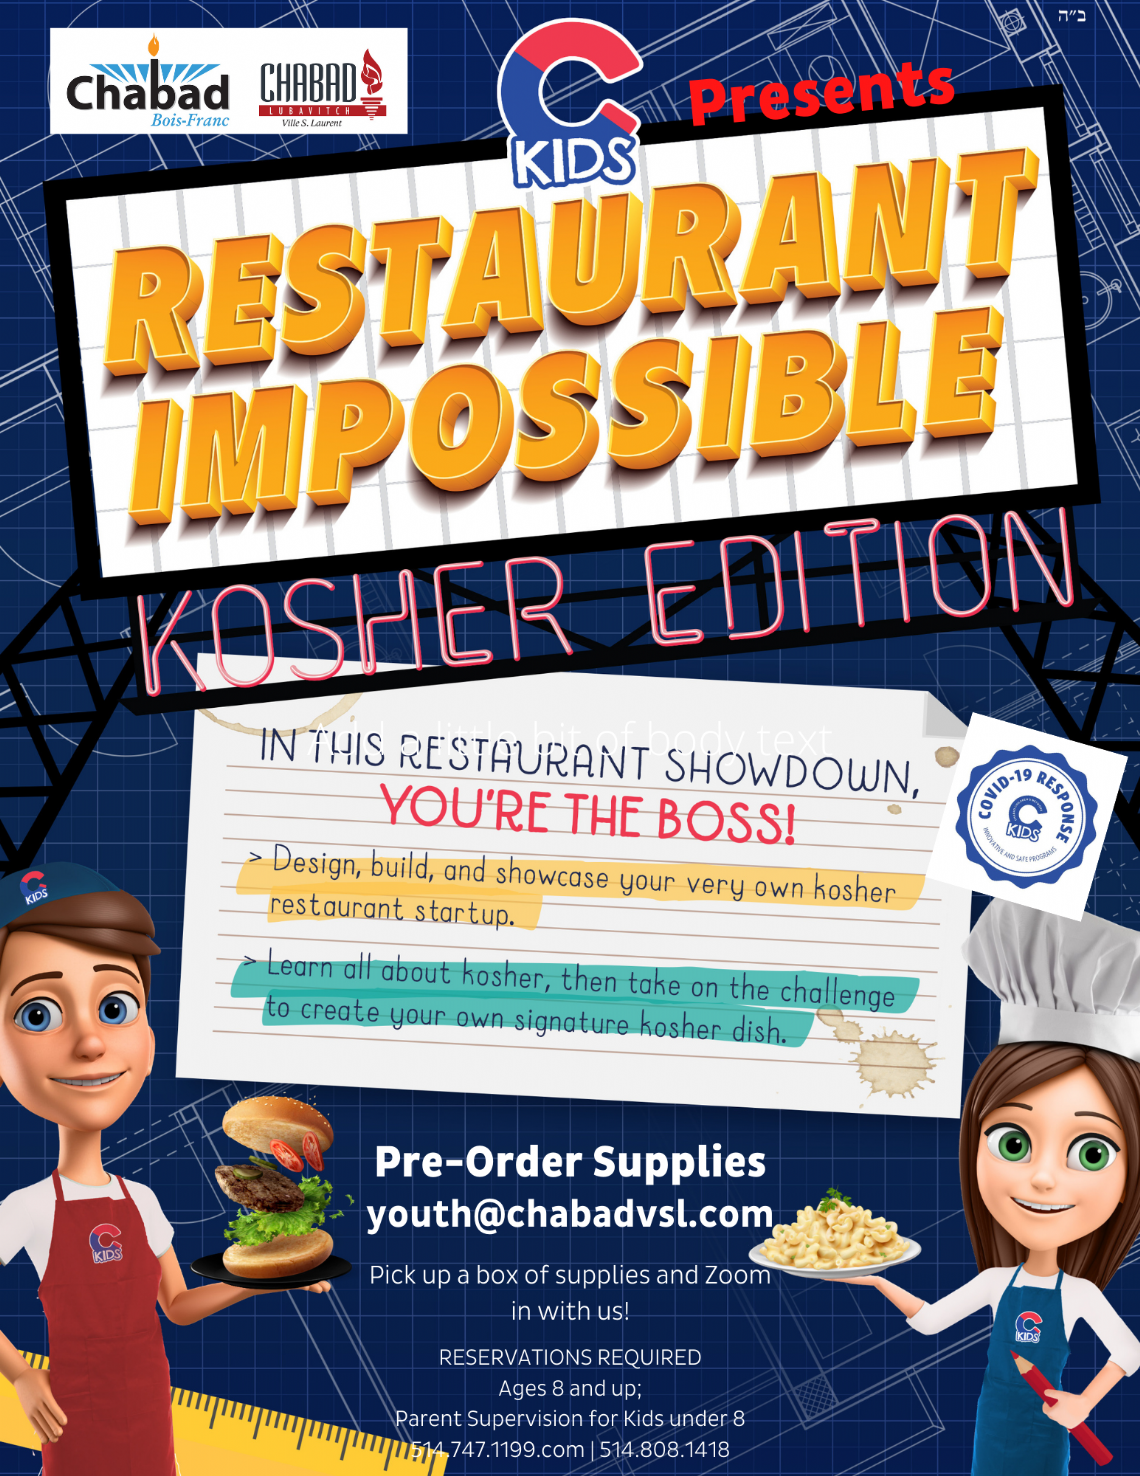 CKids Club Kosher Club Chabad V.s.L..png